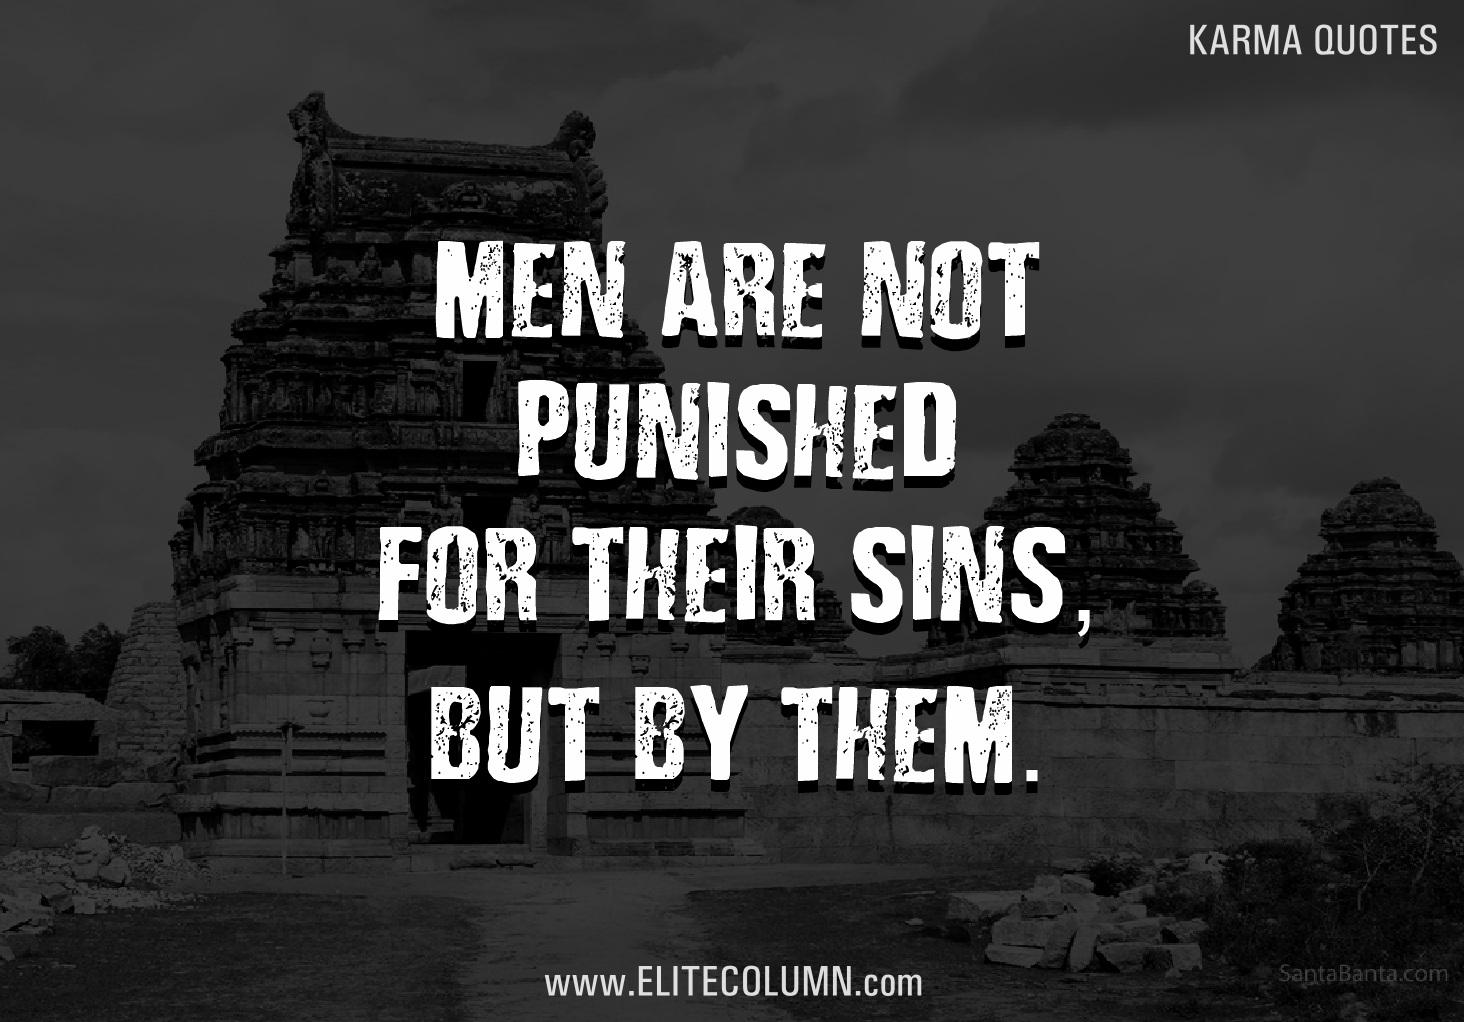 Karma Quotes (9)